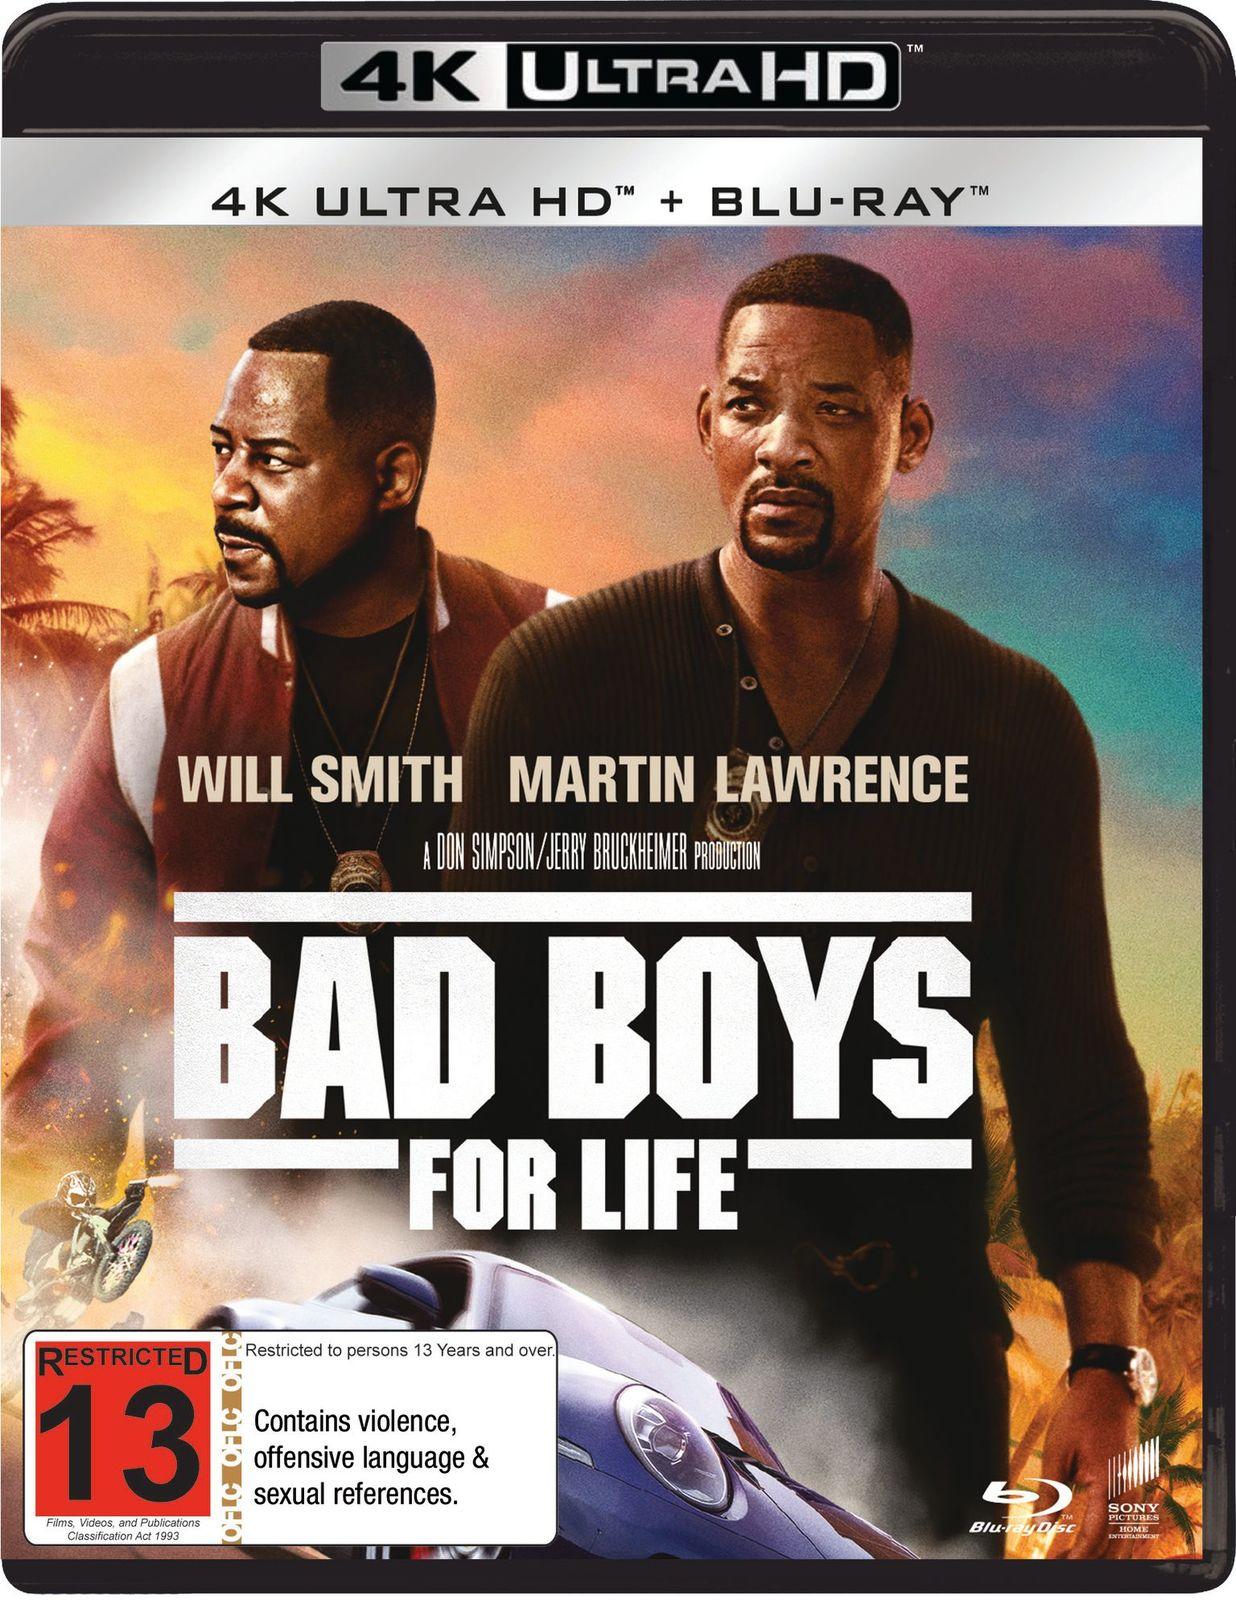 Bad Boys for Life (4K Ultra HD Blu-ray) on UHD Blu-ray image